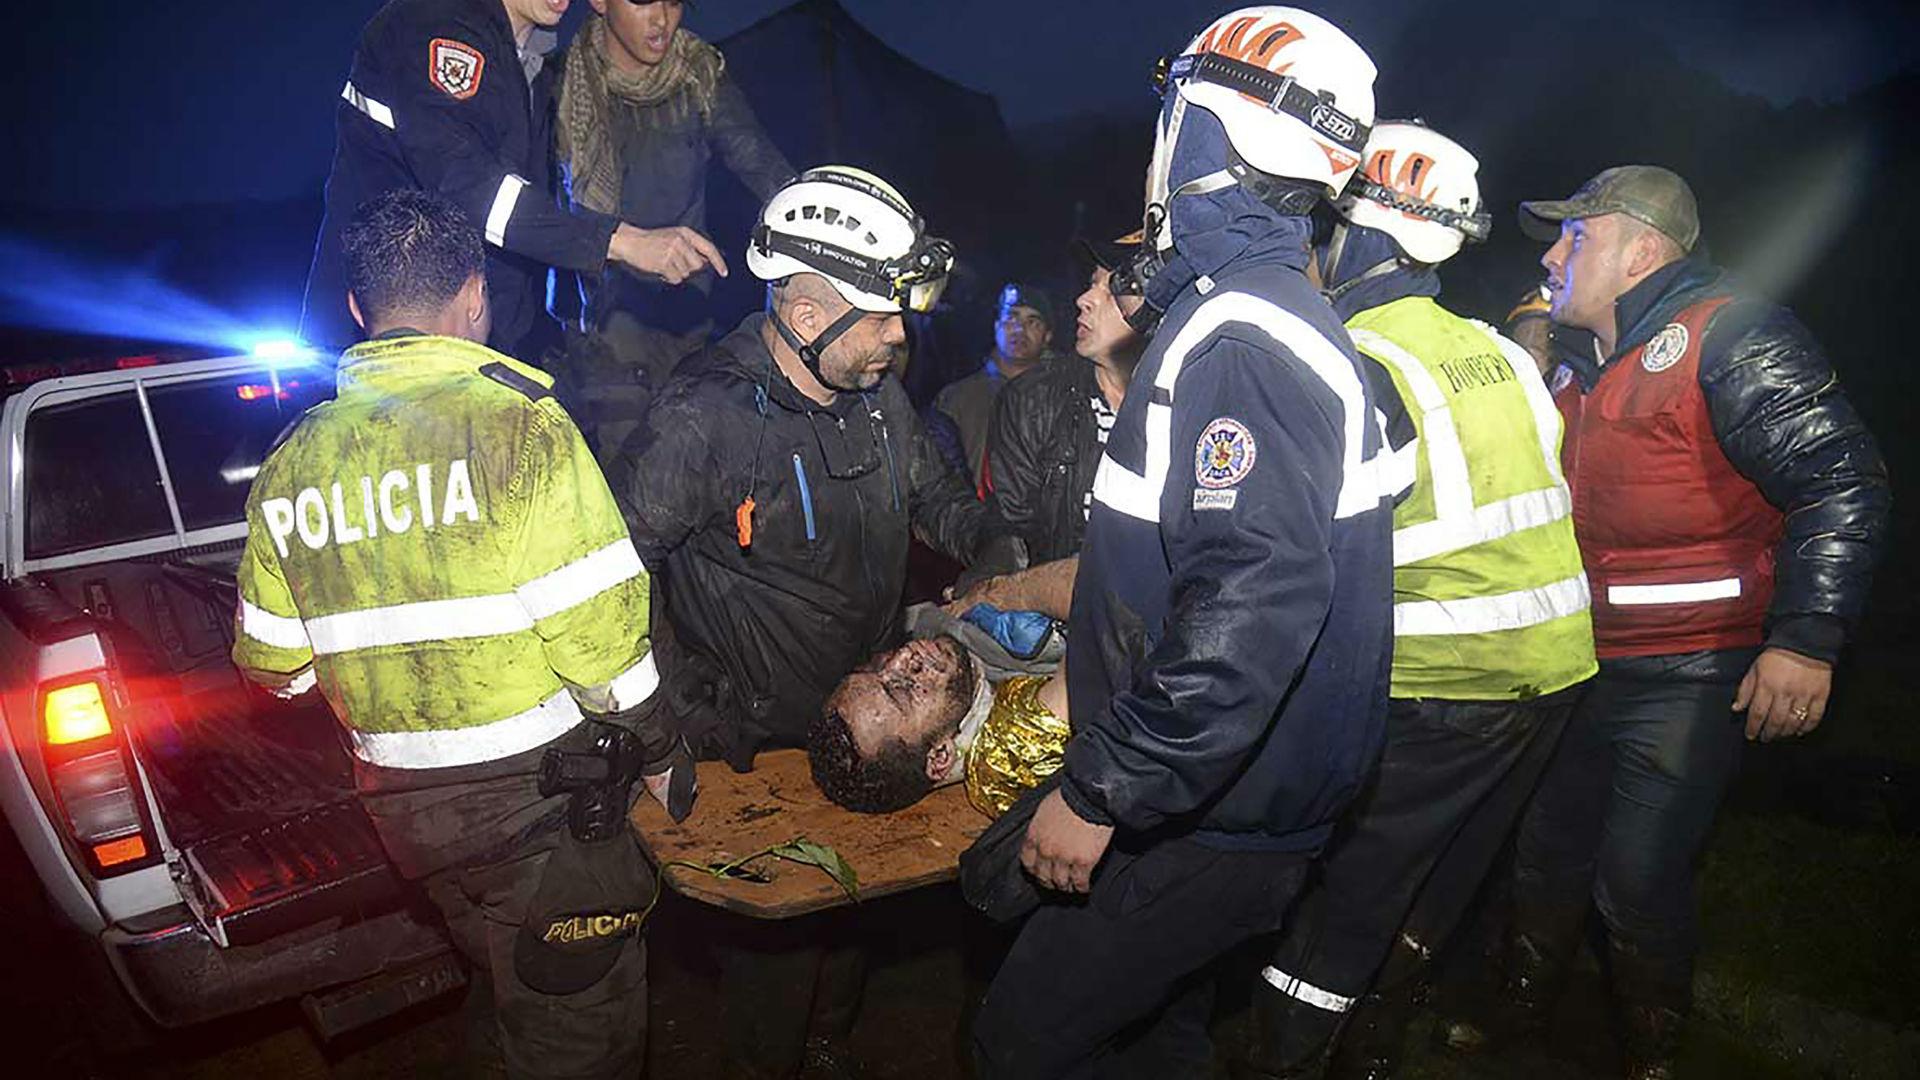 Amputata gamba destra al portiere Follman, superstite tragedia Chapecoense